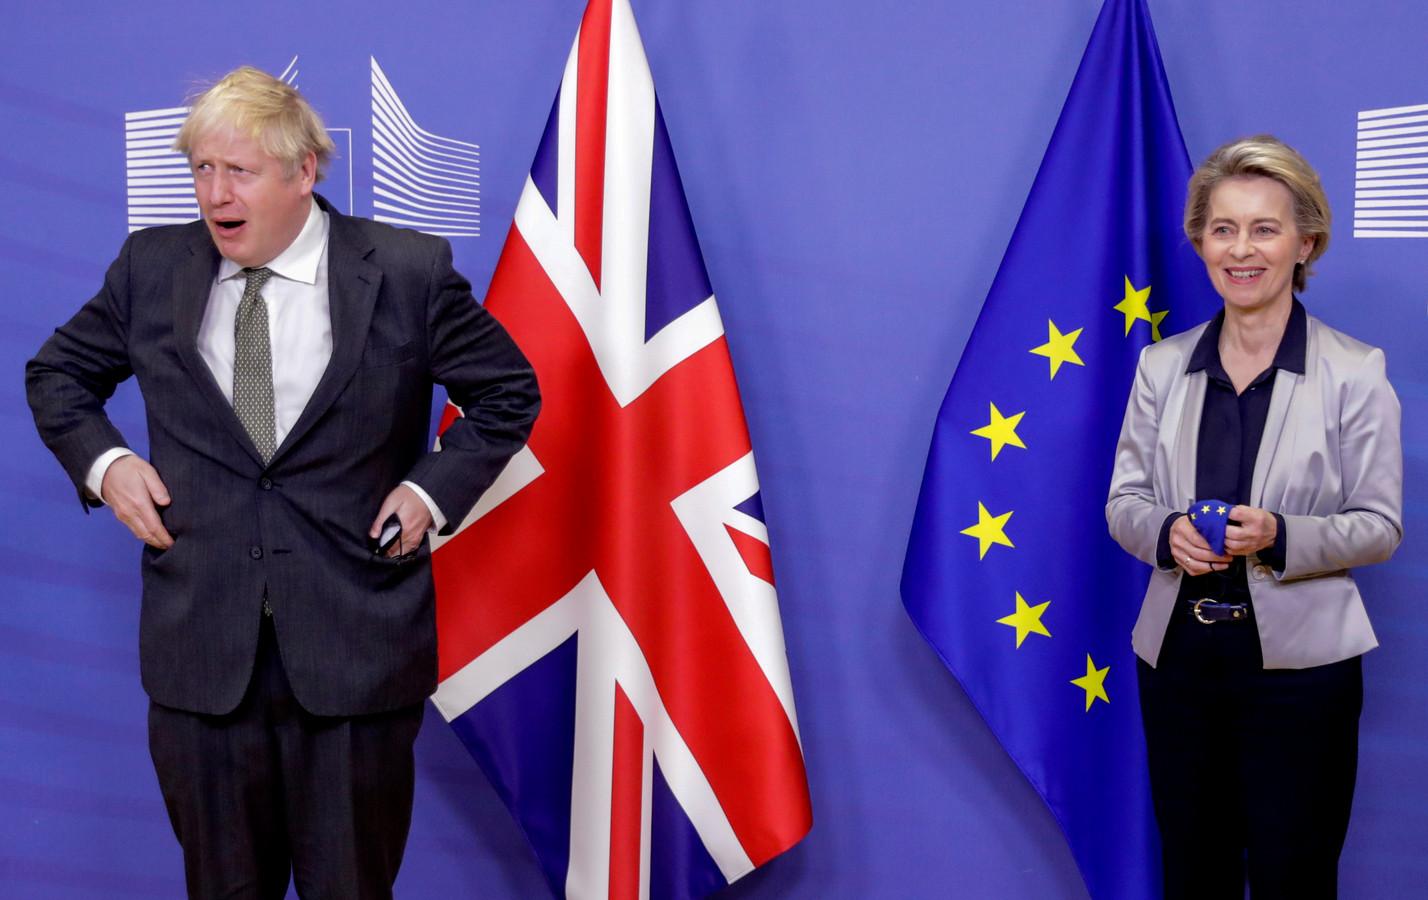 De Britse premier Boris Johnson en de president van de Europese Commissie Ursula von der Leyen.